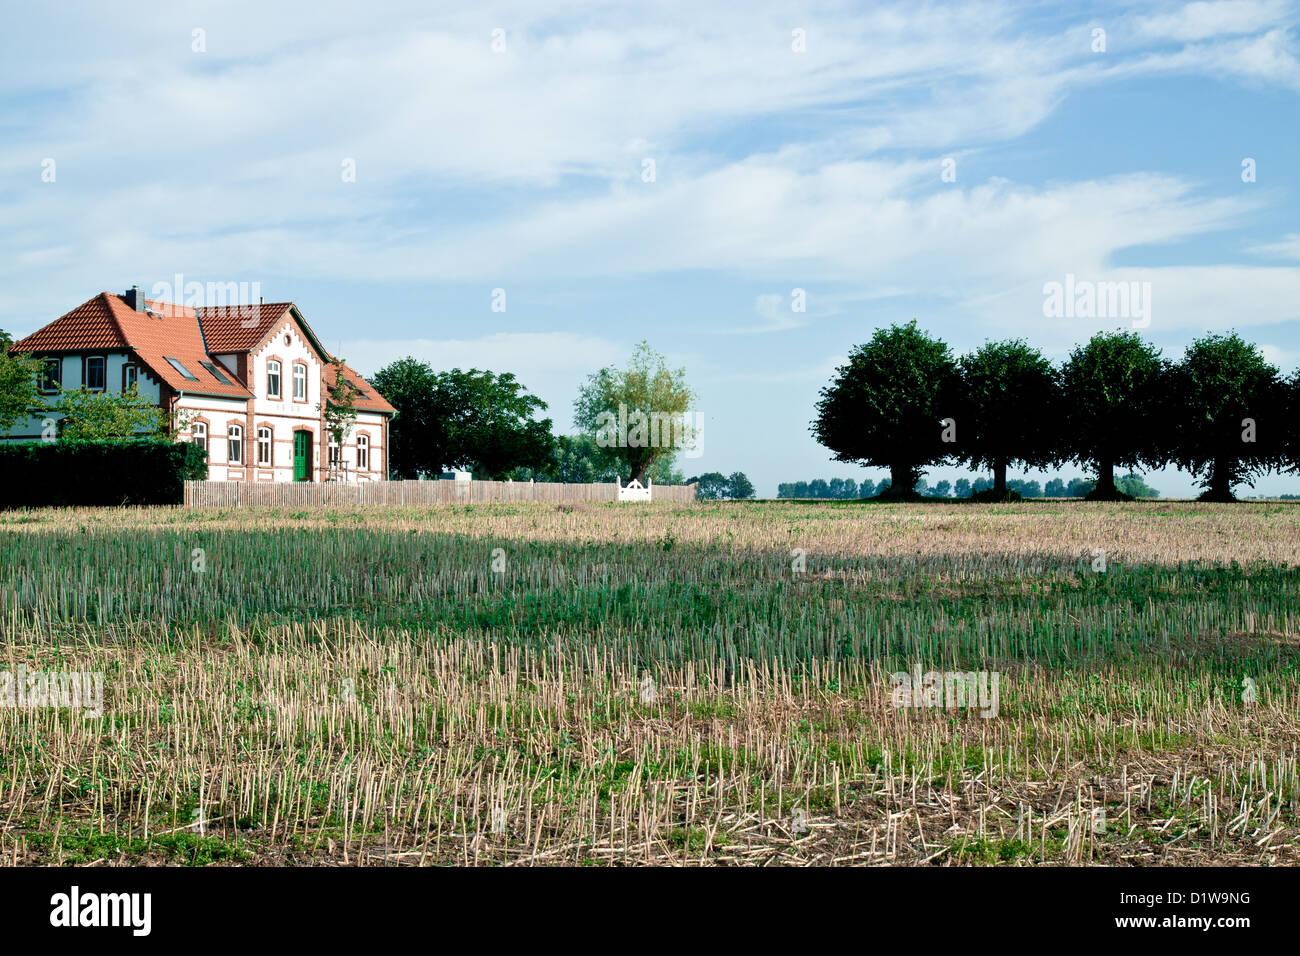 Landschaft in Insel Poel, Deutschland Stockbild